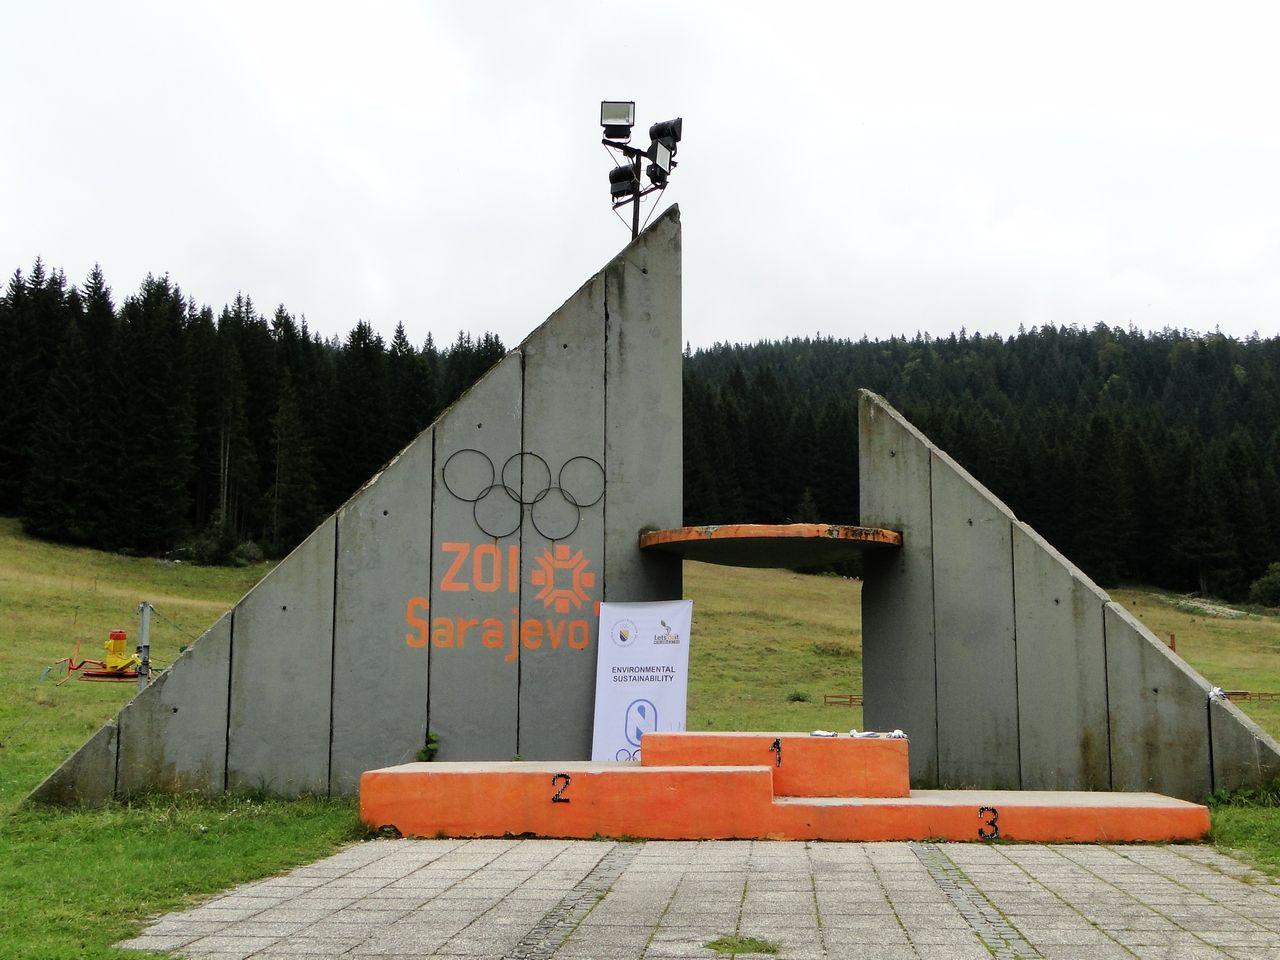 Sarajevo - abandoned places - Olympic Ski Jump medal plaza